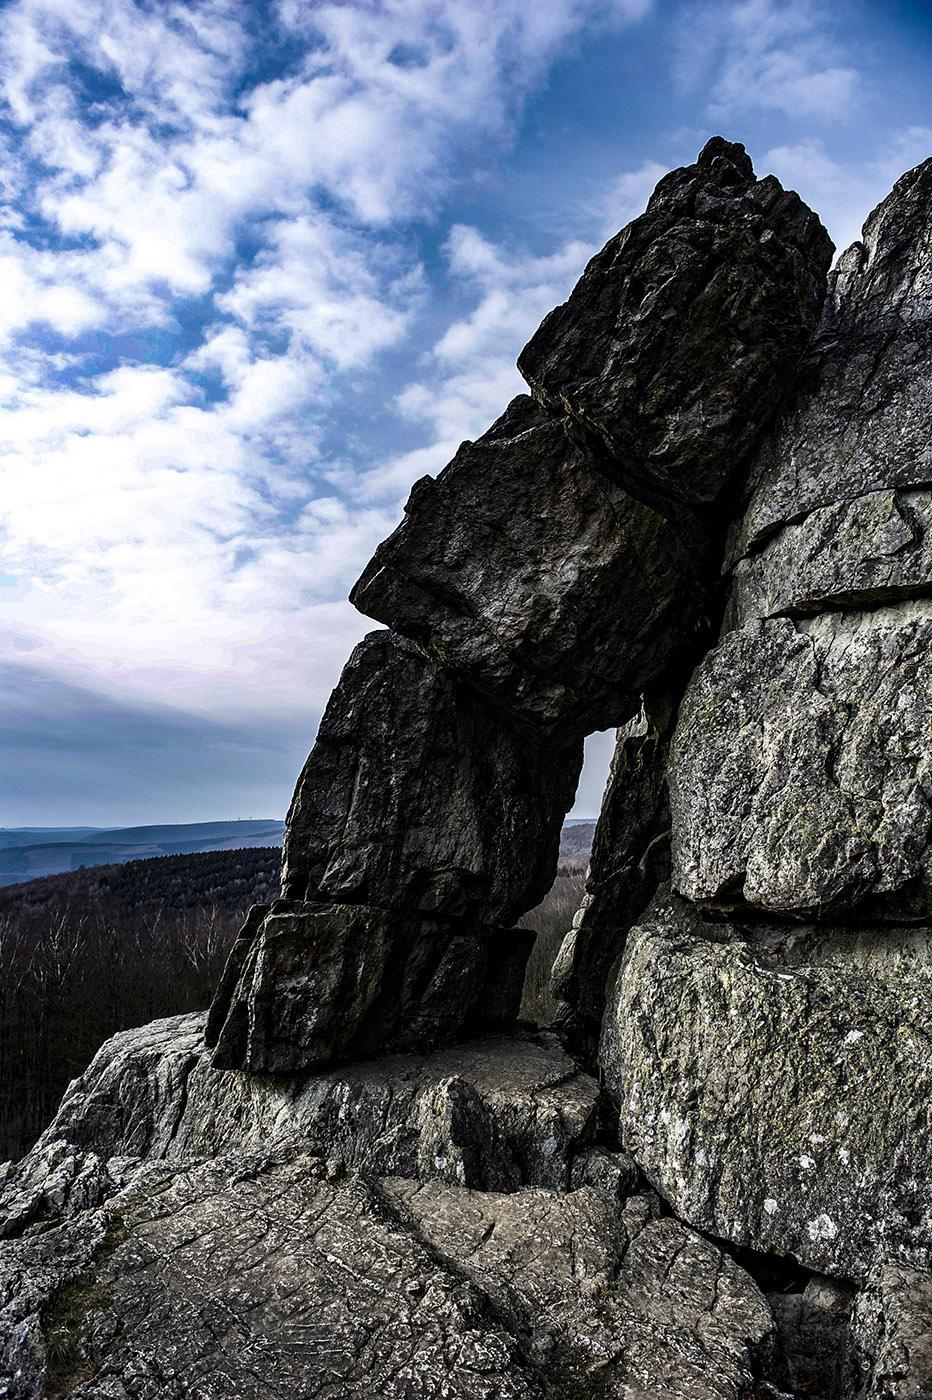 Maas: verwunschene Felsen bei Monthermé. Foto: Hilke Maunder